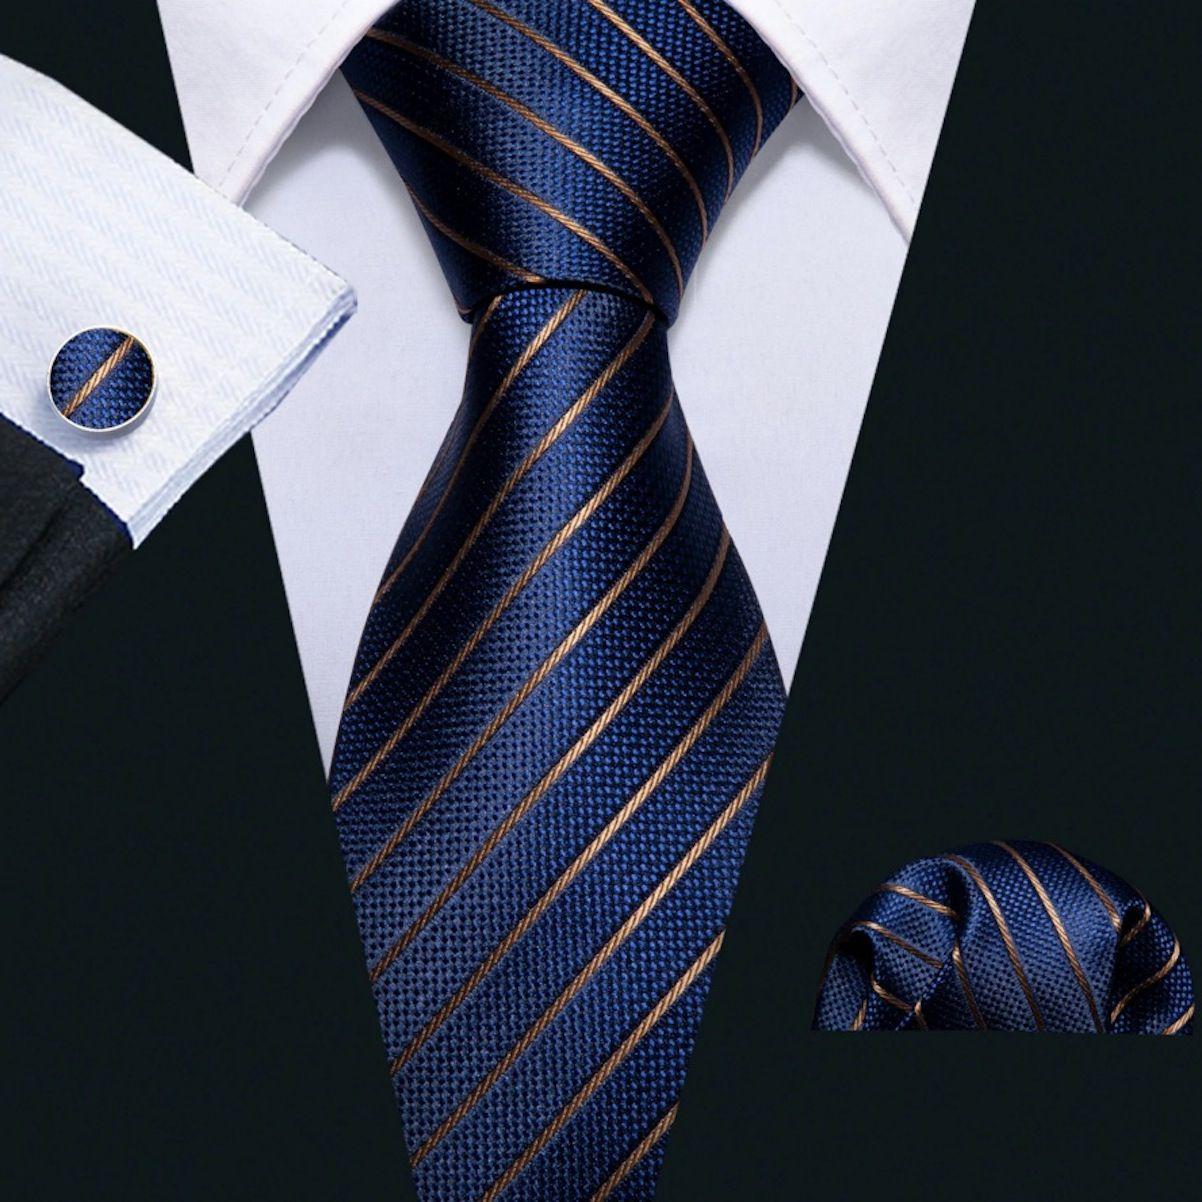 Kit Gravata Seda Azul Marinho Listras Dourada +lenço +bots